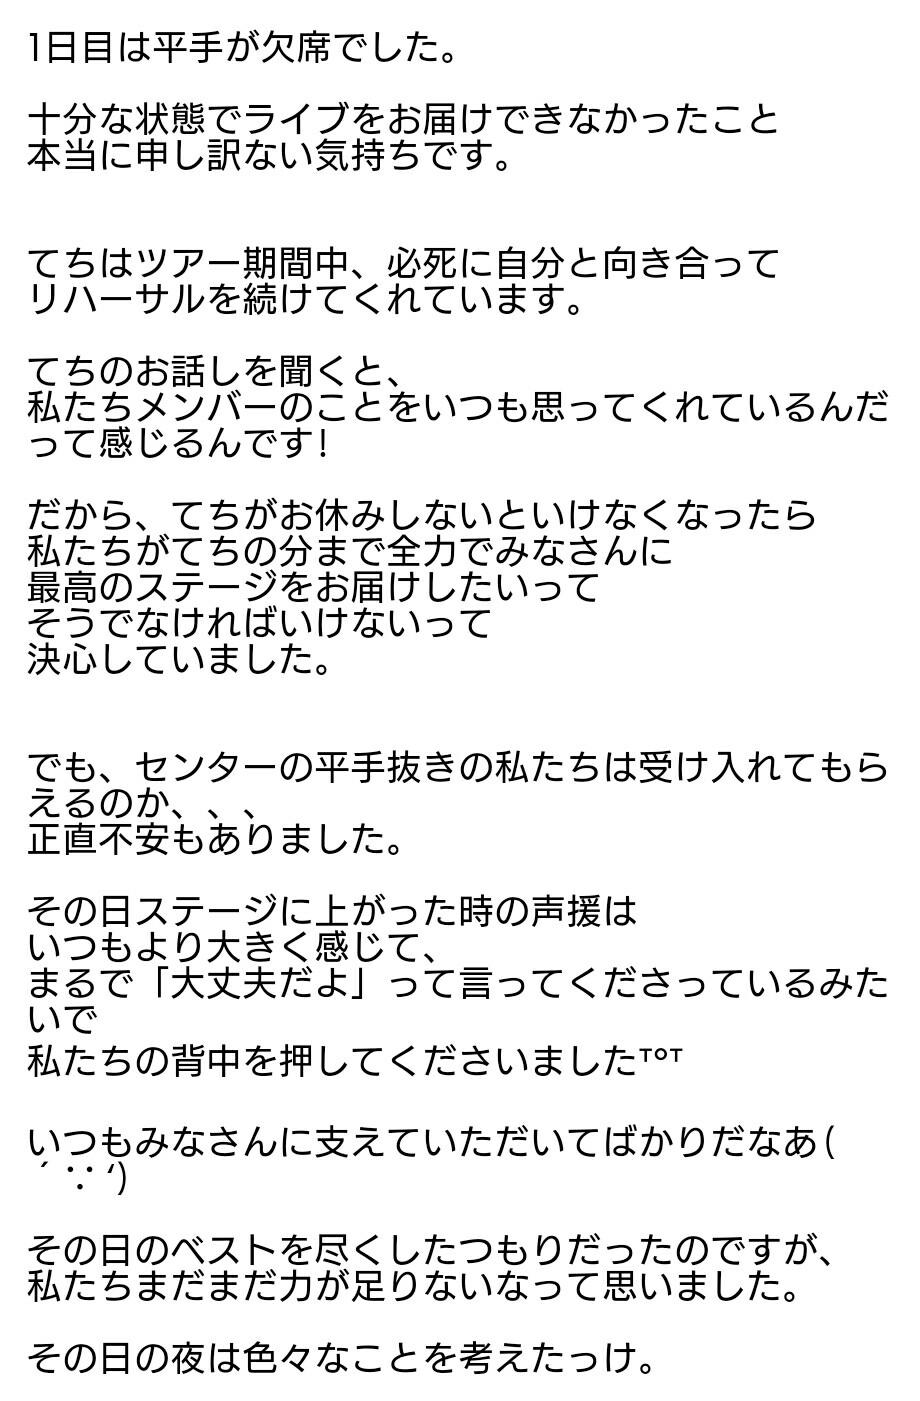 f:id:asitaha46:20170819050447j:image